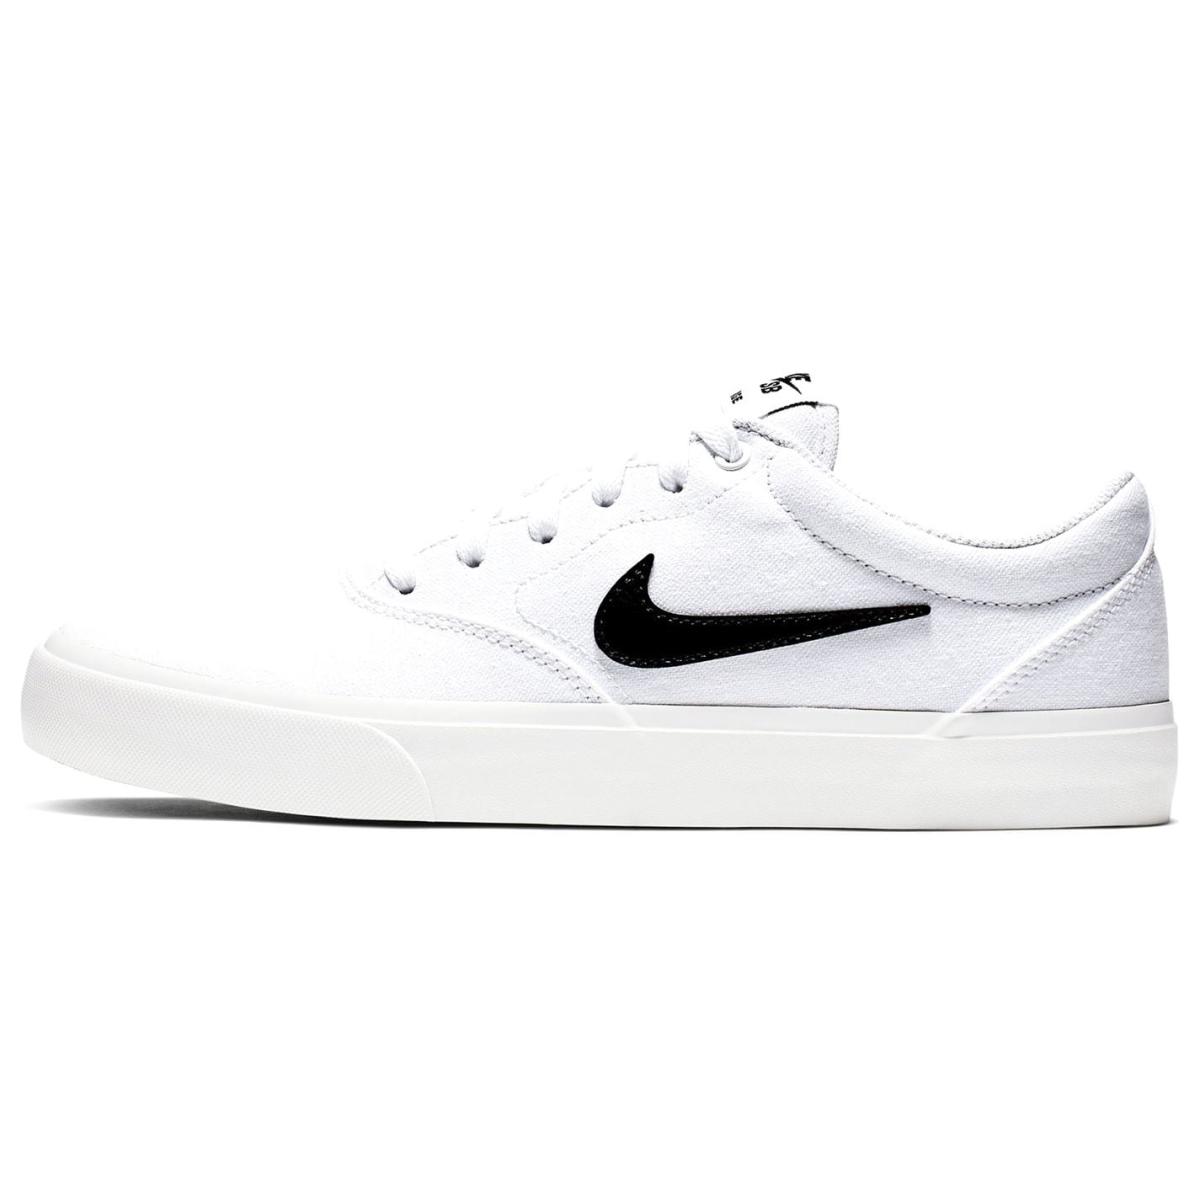 Nike-SB-Lot-Solarsoft-Skate-Chaussures-Messieurs-Skater-Chaussures-De-Sport-Skate-2162 miniature 67